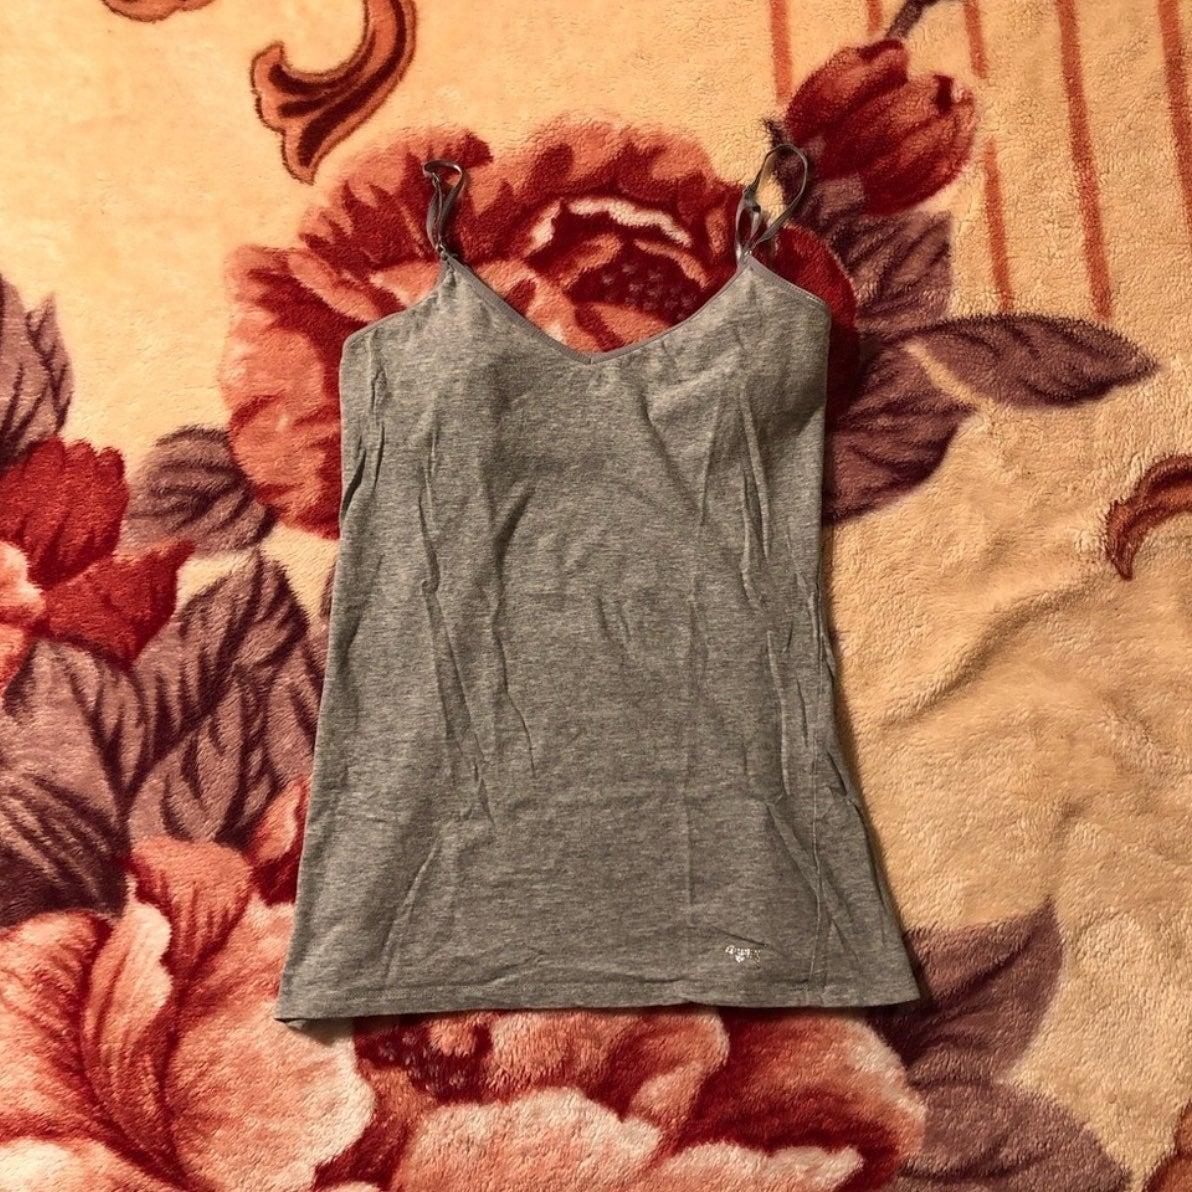 Gray camisole